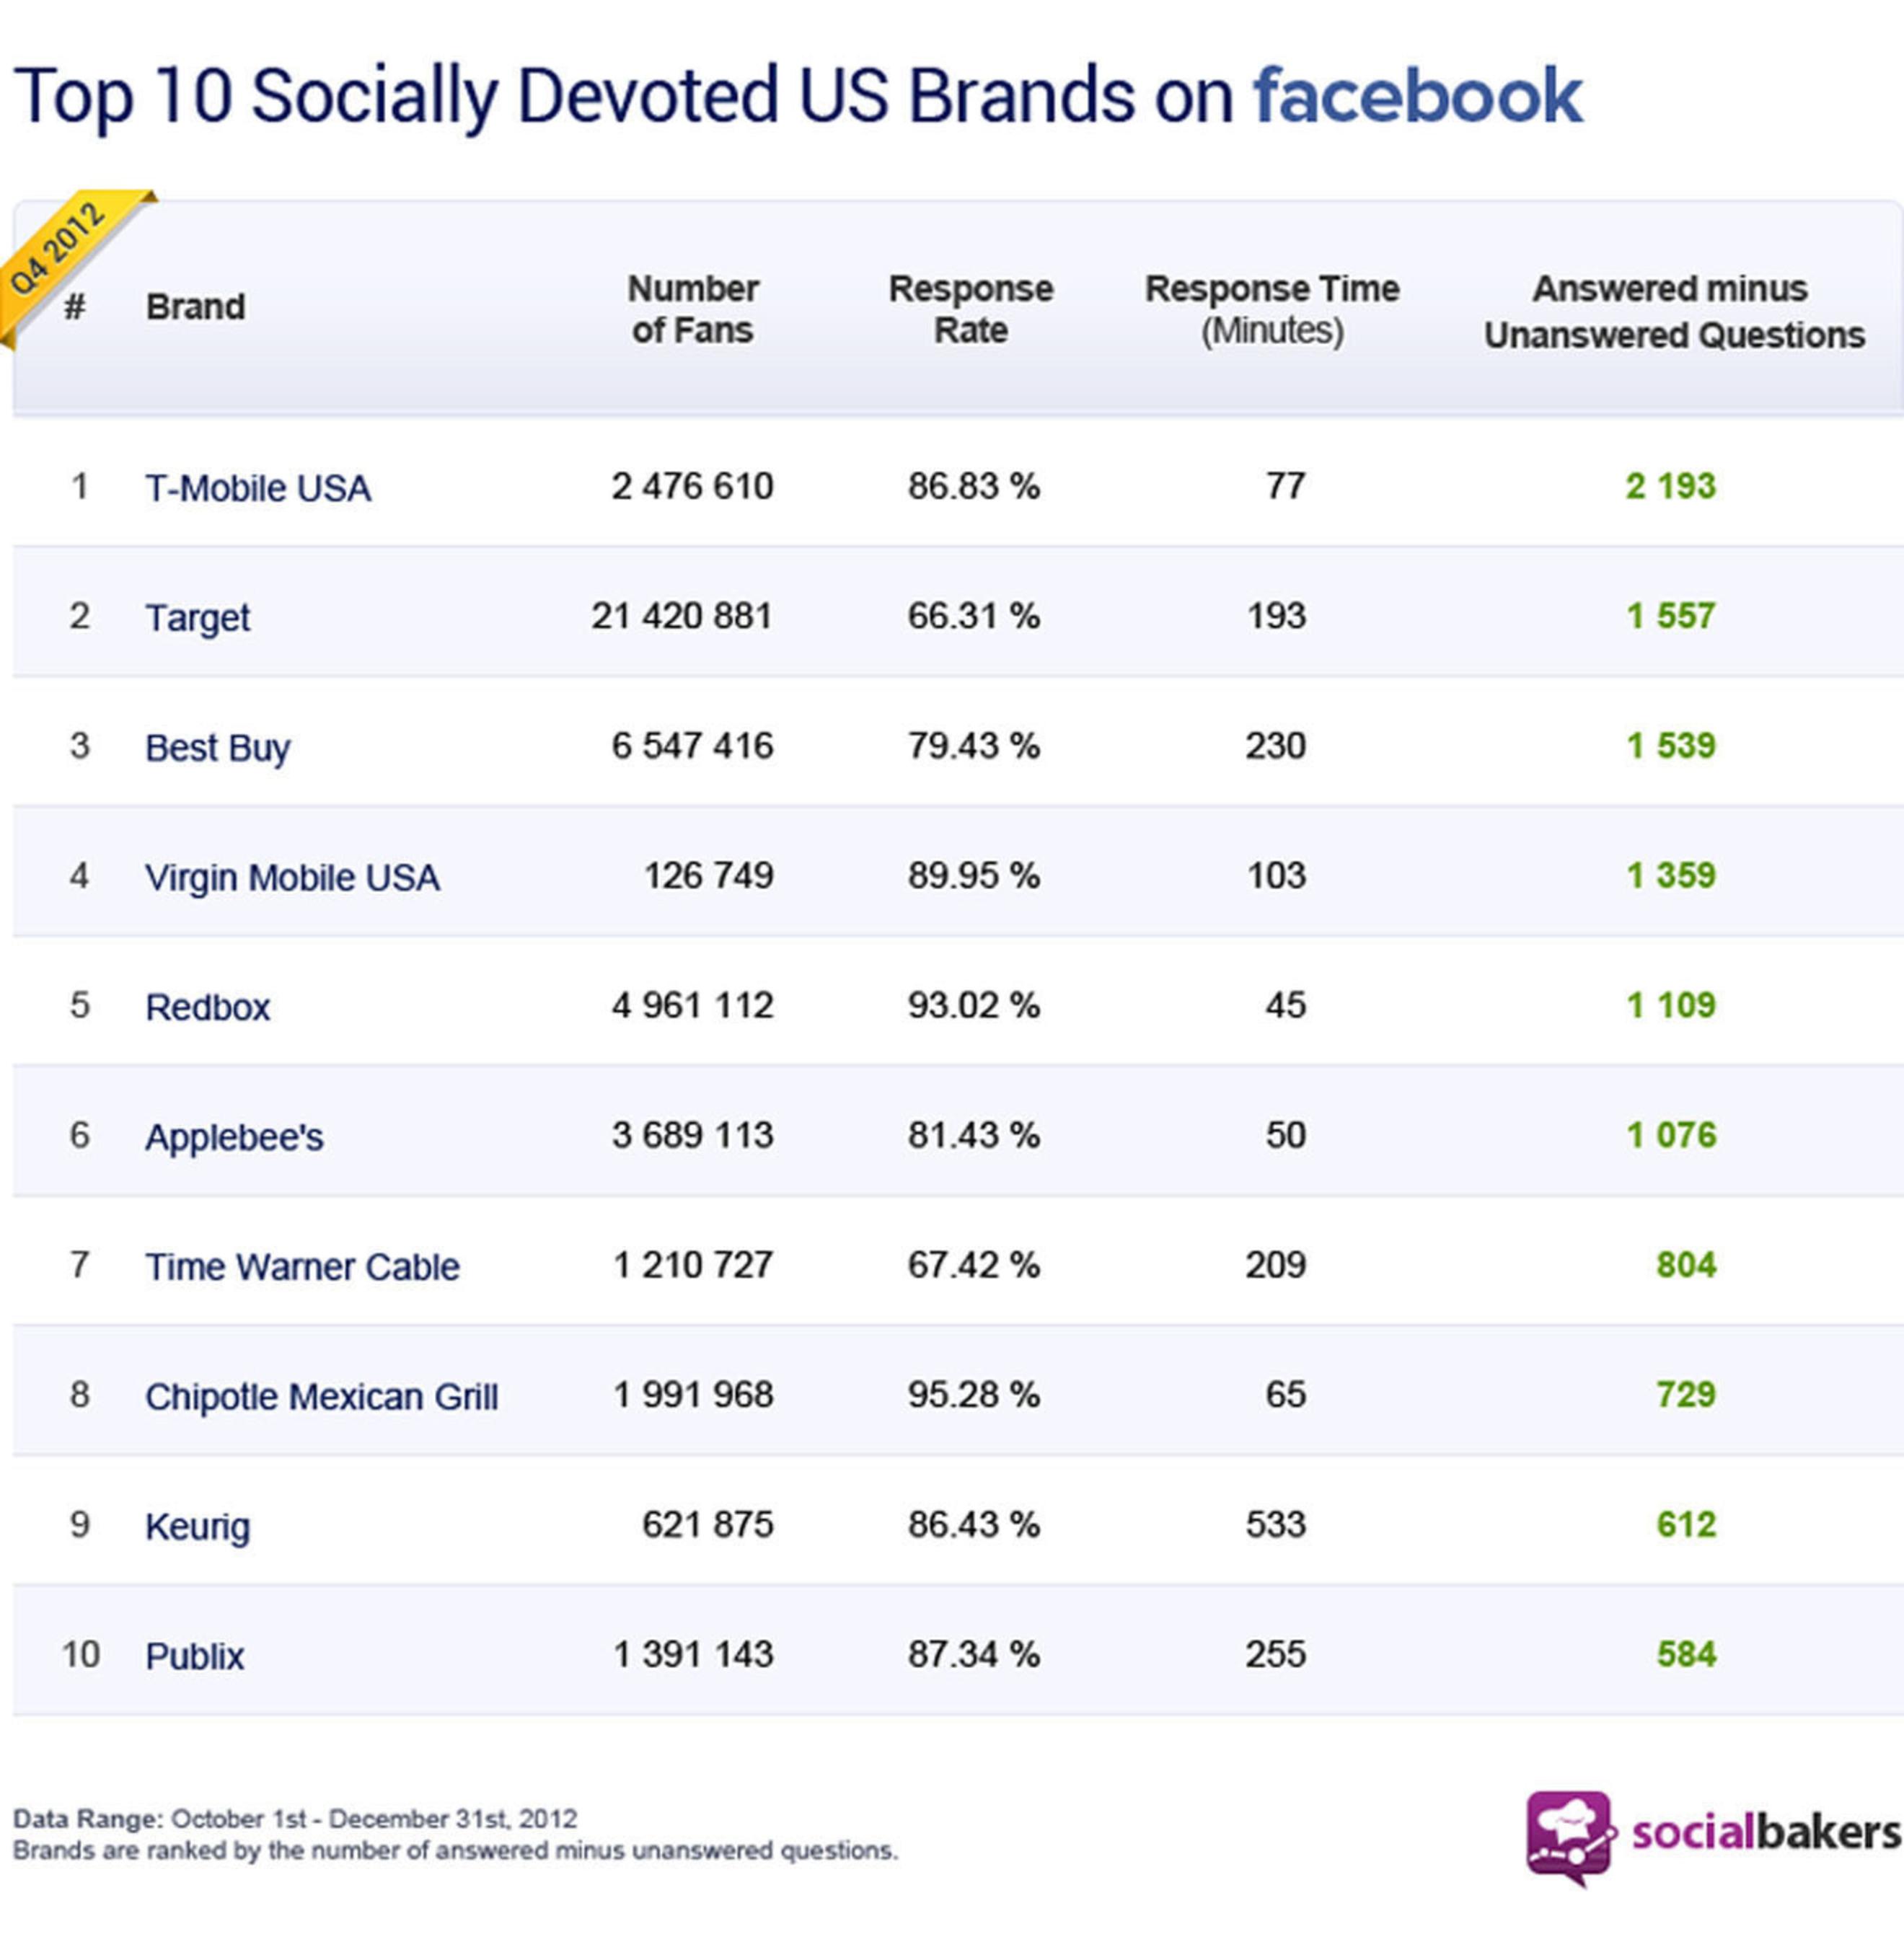 Socialbakers Top 10 Socially Devoted Brands in the U.S. (PRNewsFoto/Socialbakers) (PRNewsFoto/SOCIALBAKERS)